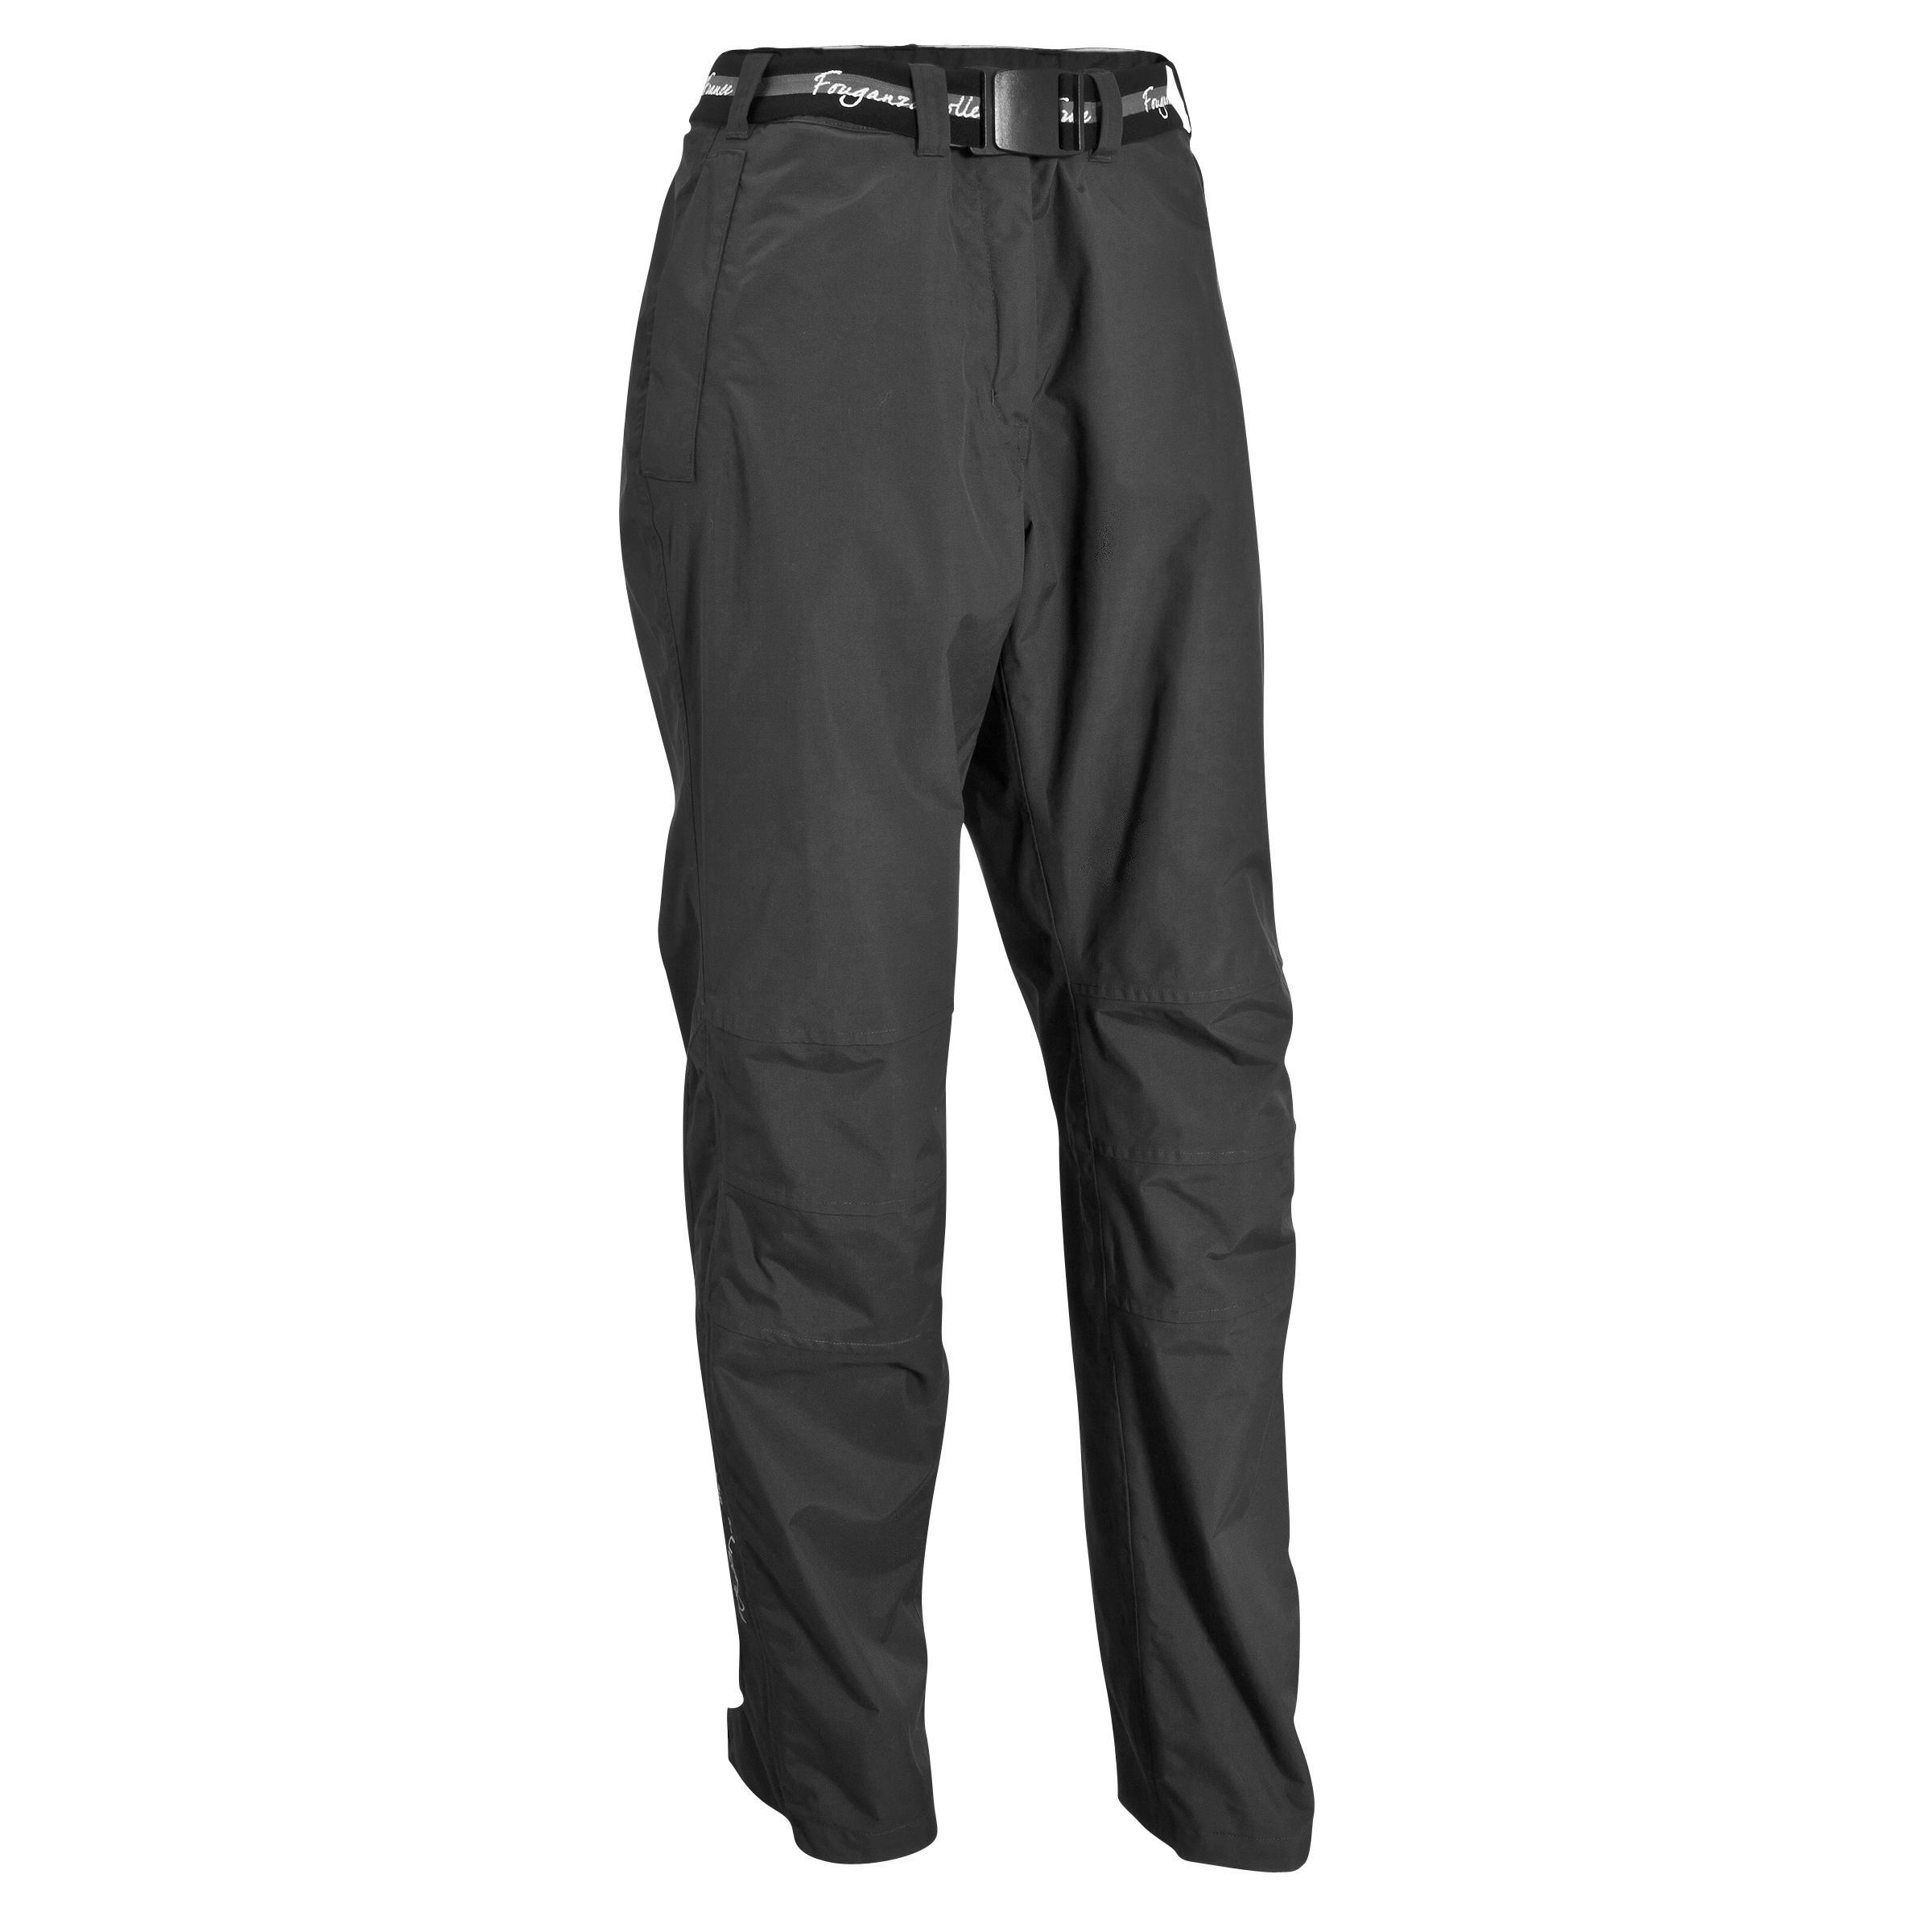 Reit-Regenhose 500 2-in-1 schwarz | Sportbekleidung > Sporthosen > Regenhosen | Grau | Fouganza